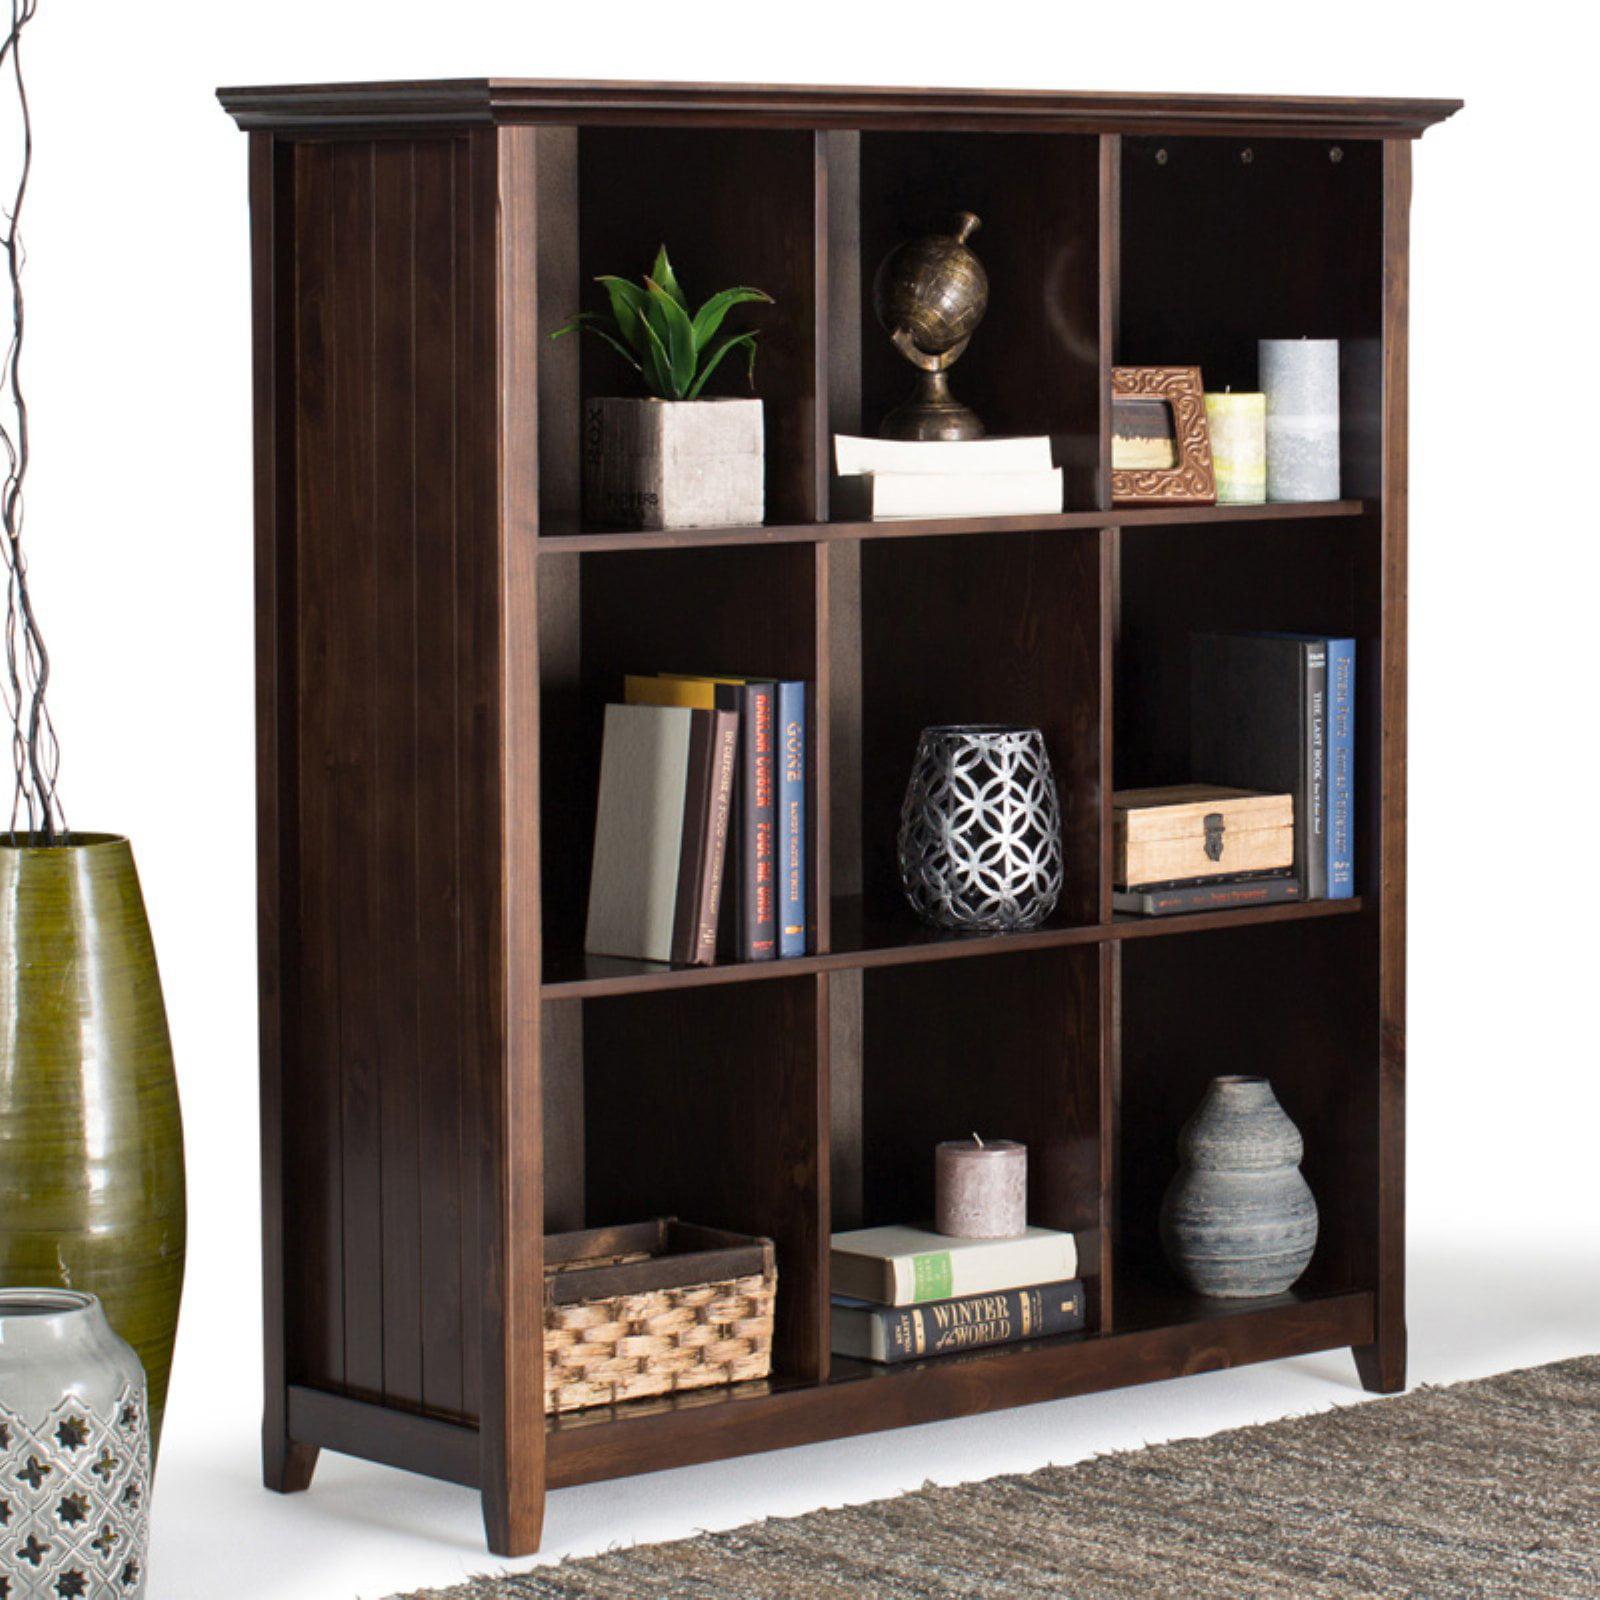 Simpli Home Acadian 9 Cube Bookcase & Storage Unit